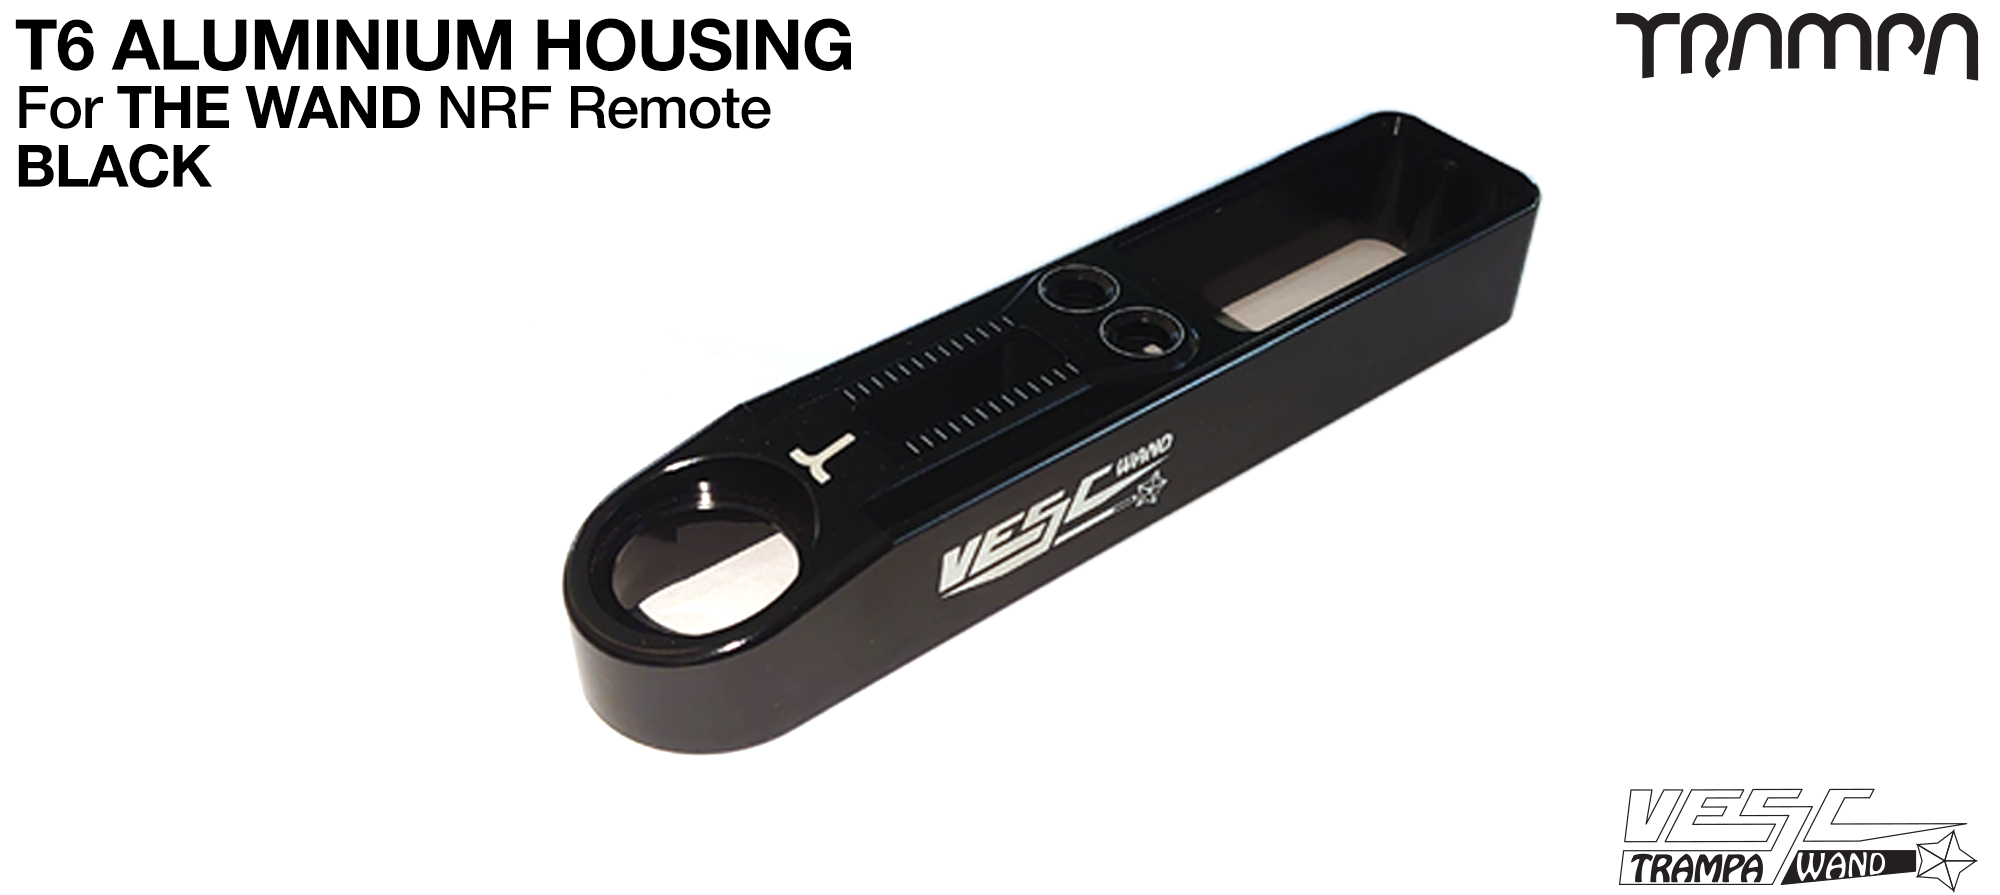 WAND - T6 Aluminum Housing